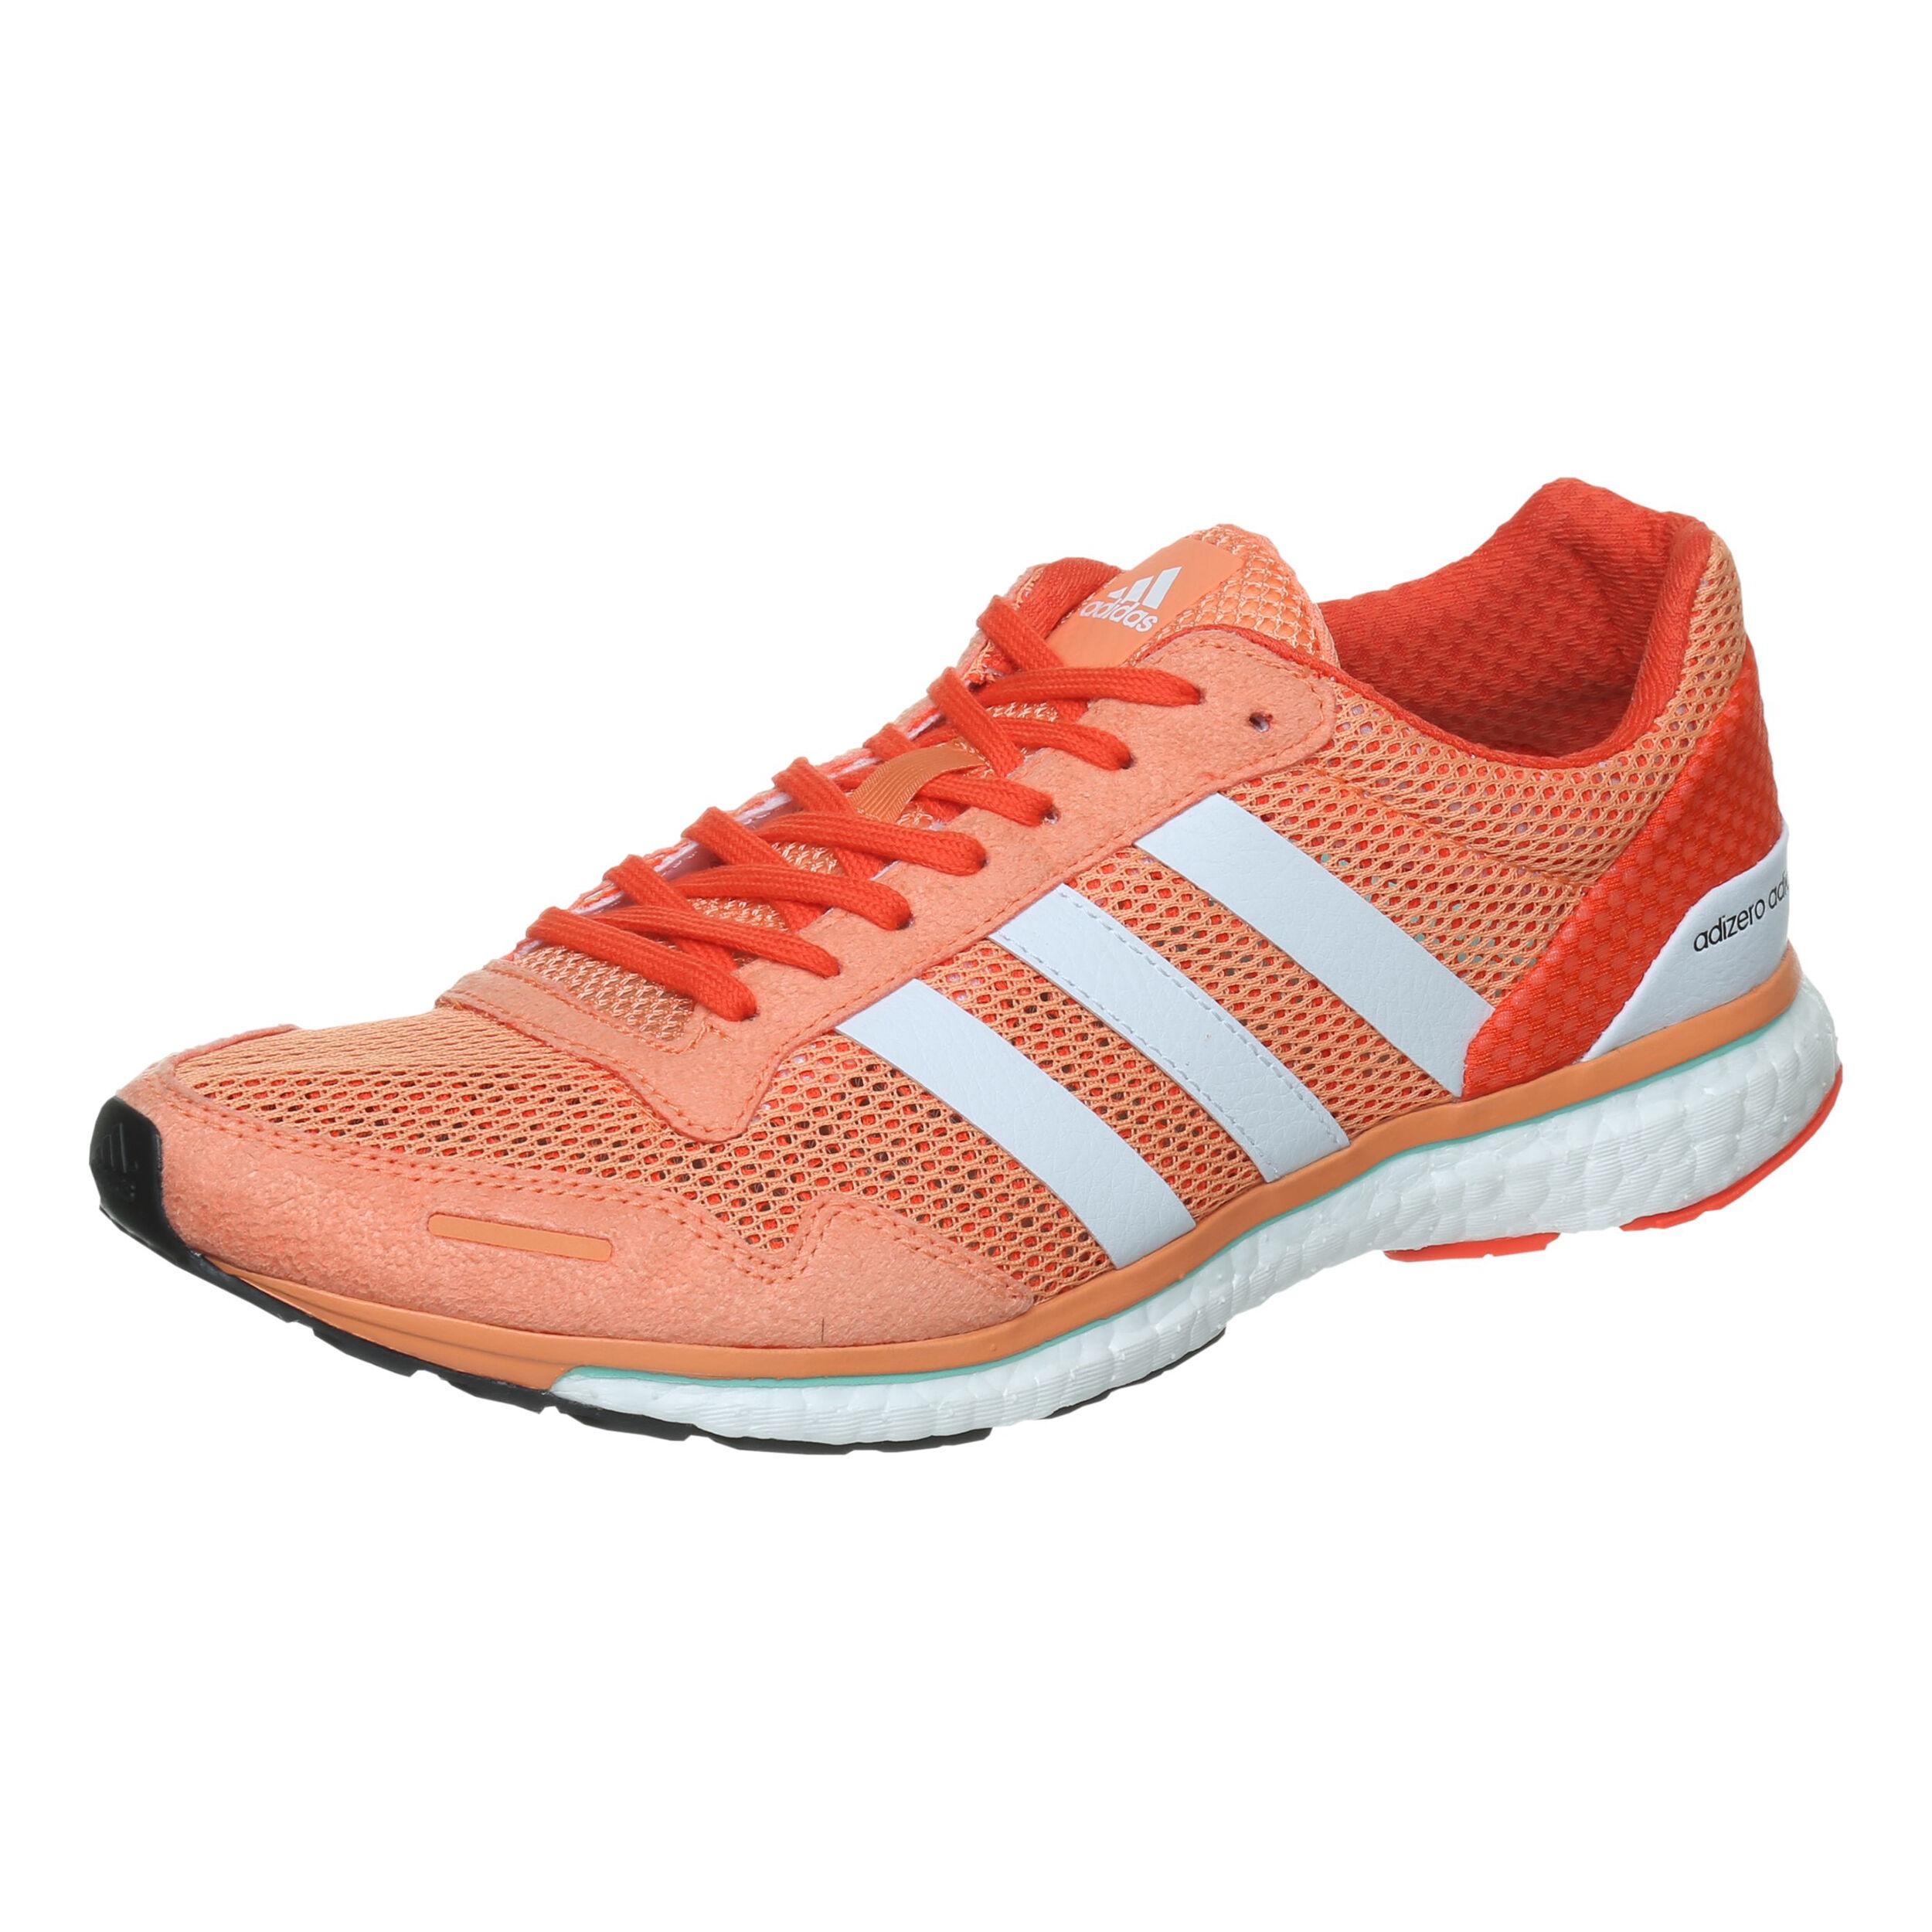 adidas Adizero Adios Wettkampfschuh Damen - Orange, Weiß ...